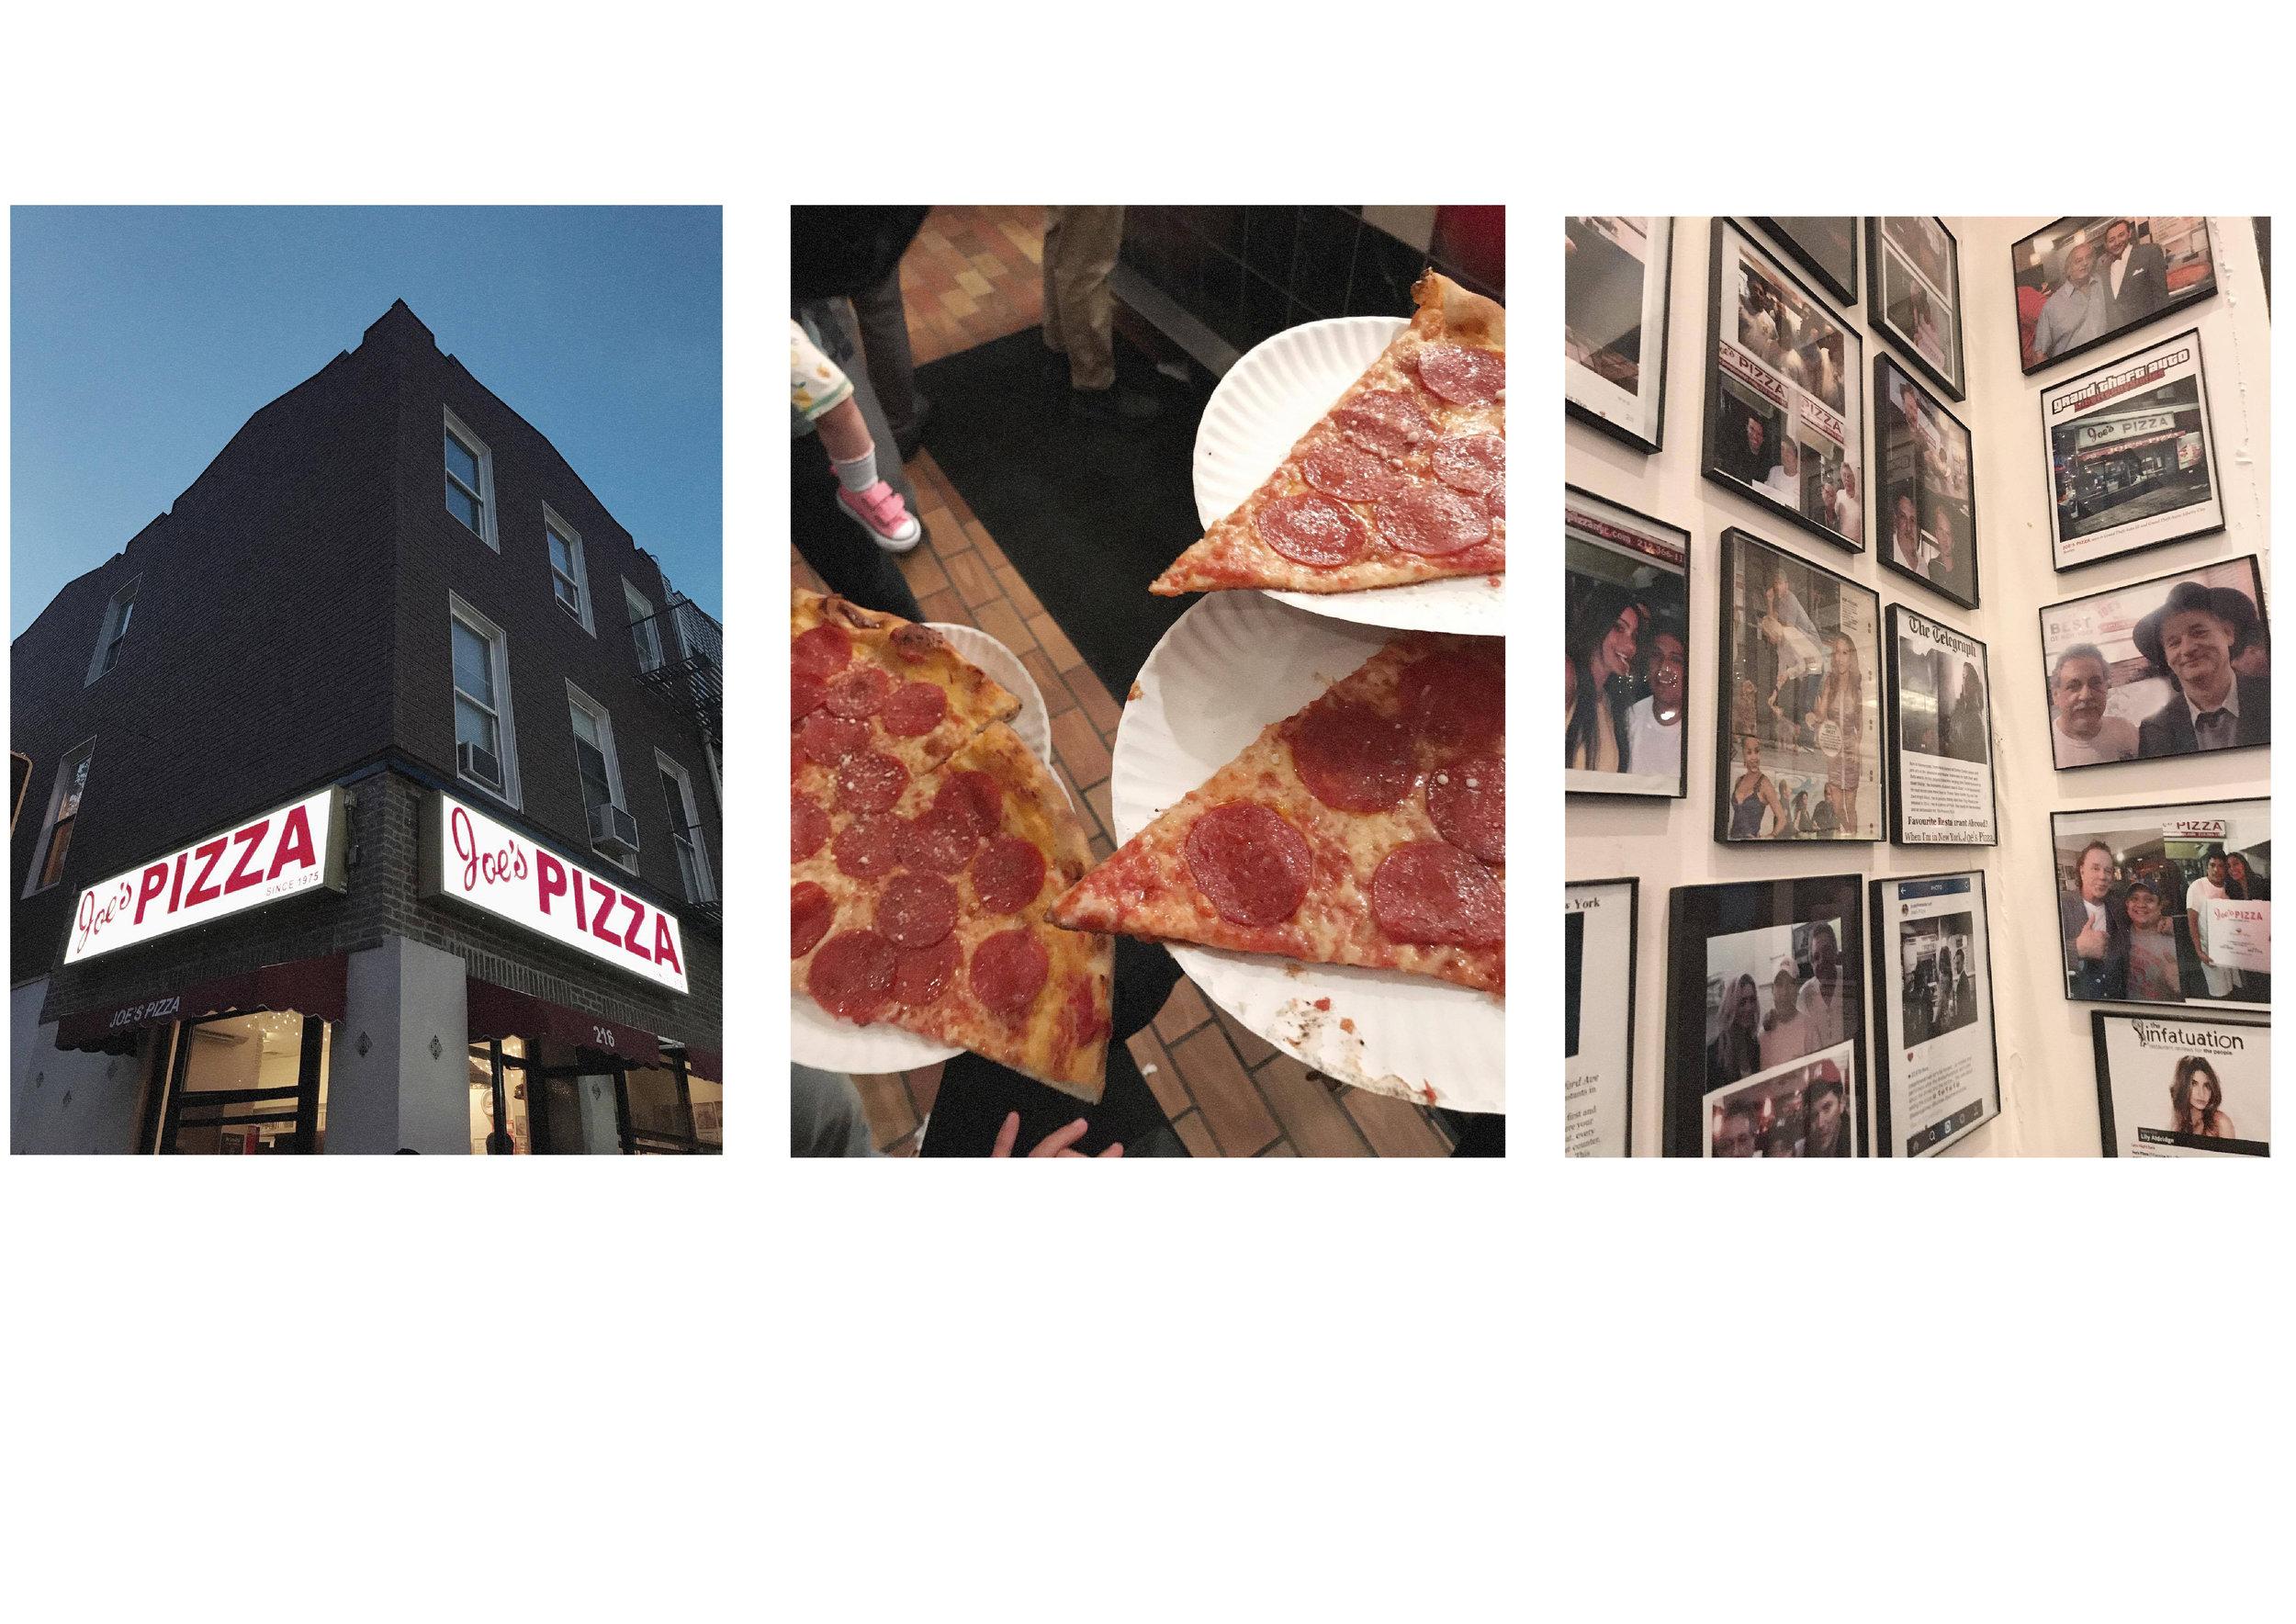 dérrive travel - JOE'S PIZZA WILLIAMSBURG, new york #joespizza #williamsburg #cafemogador #katzsdeli #soho #dumbo #newyork #nyc #brooklyn